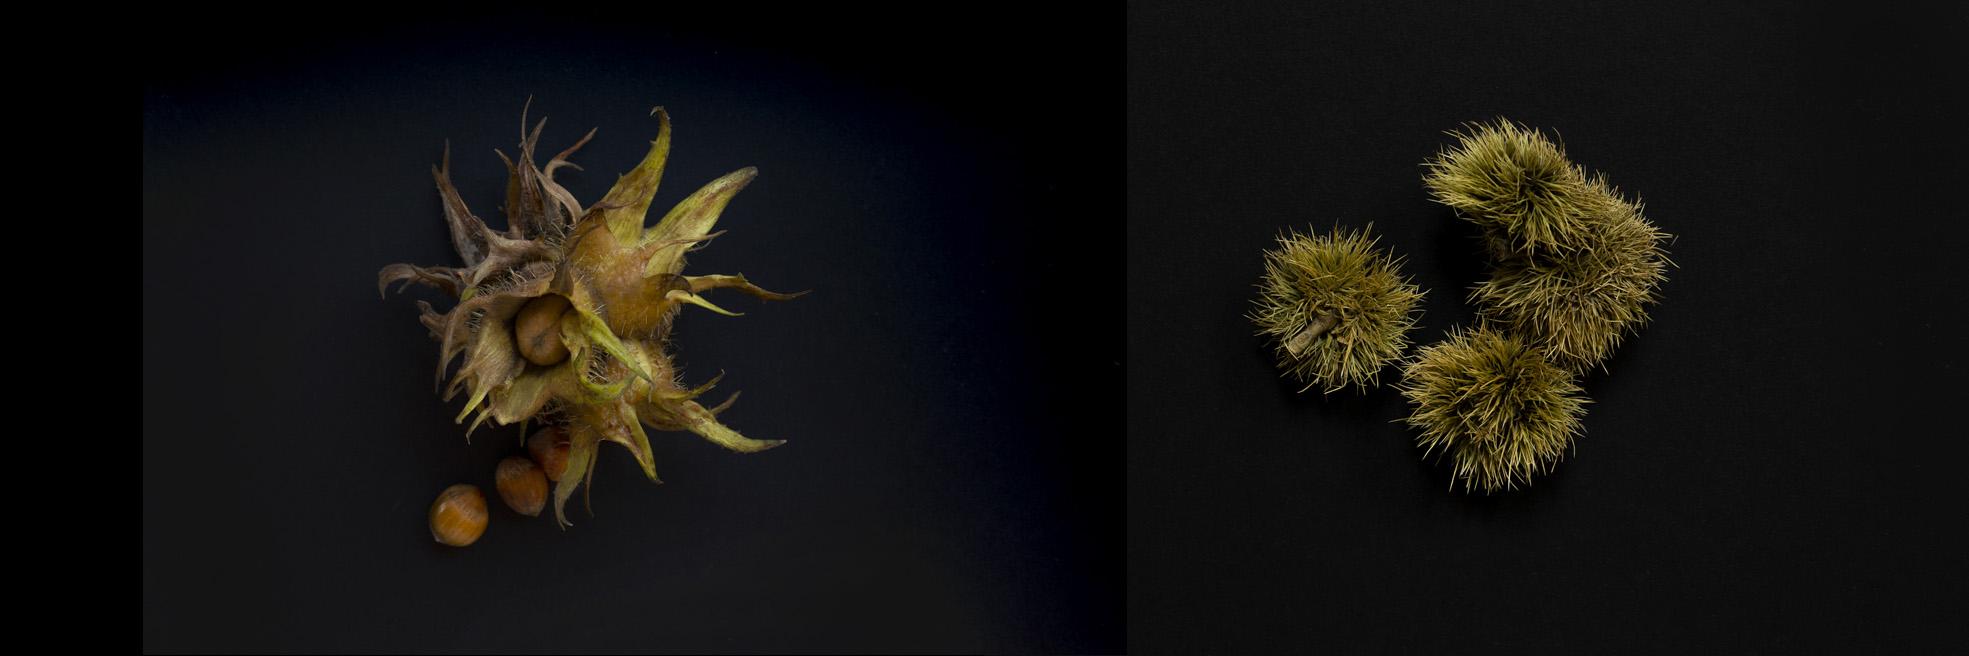 Eugene_Langan_Photography_Dublin_Ireland_Foraging_Autumn_Equinox-3x2.jpg